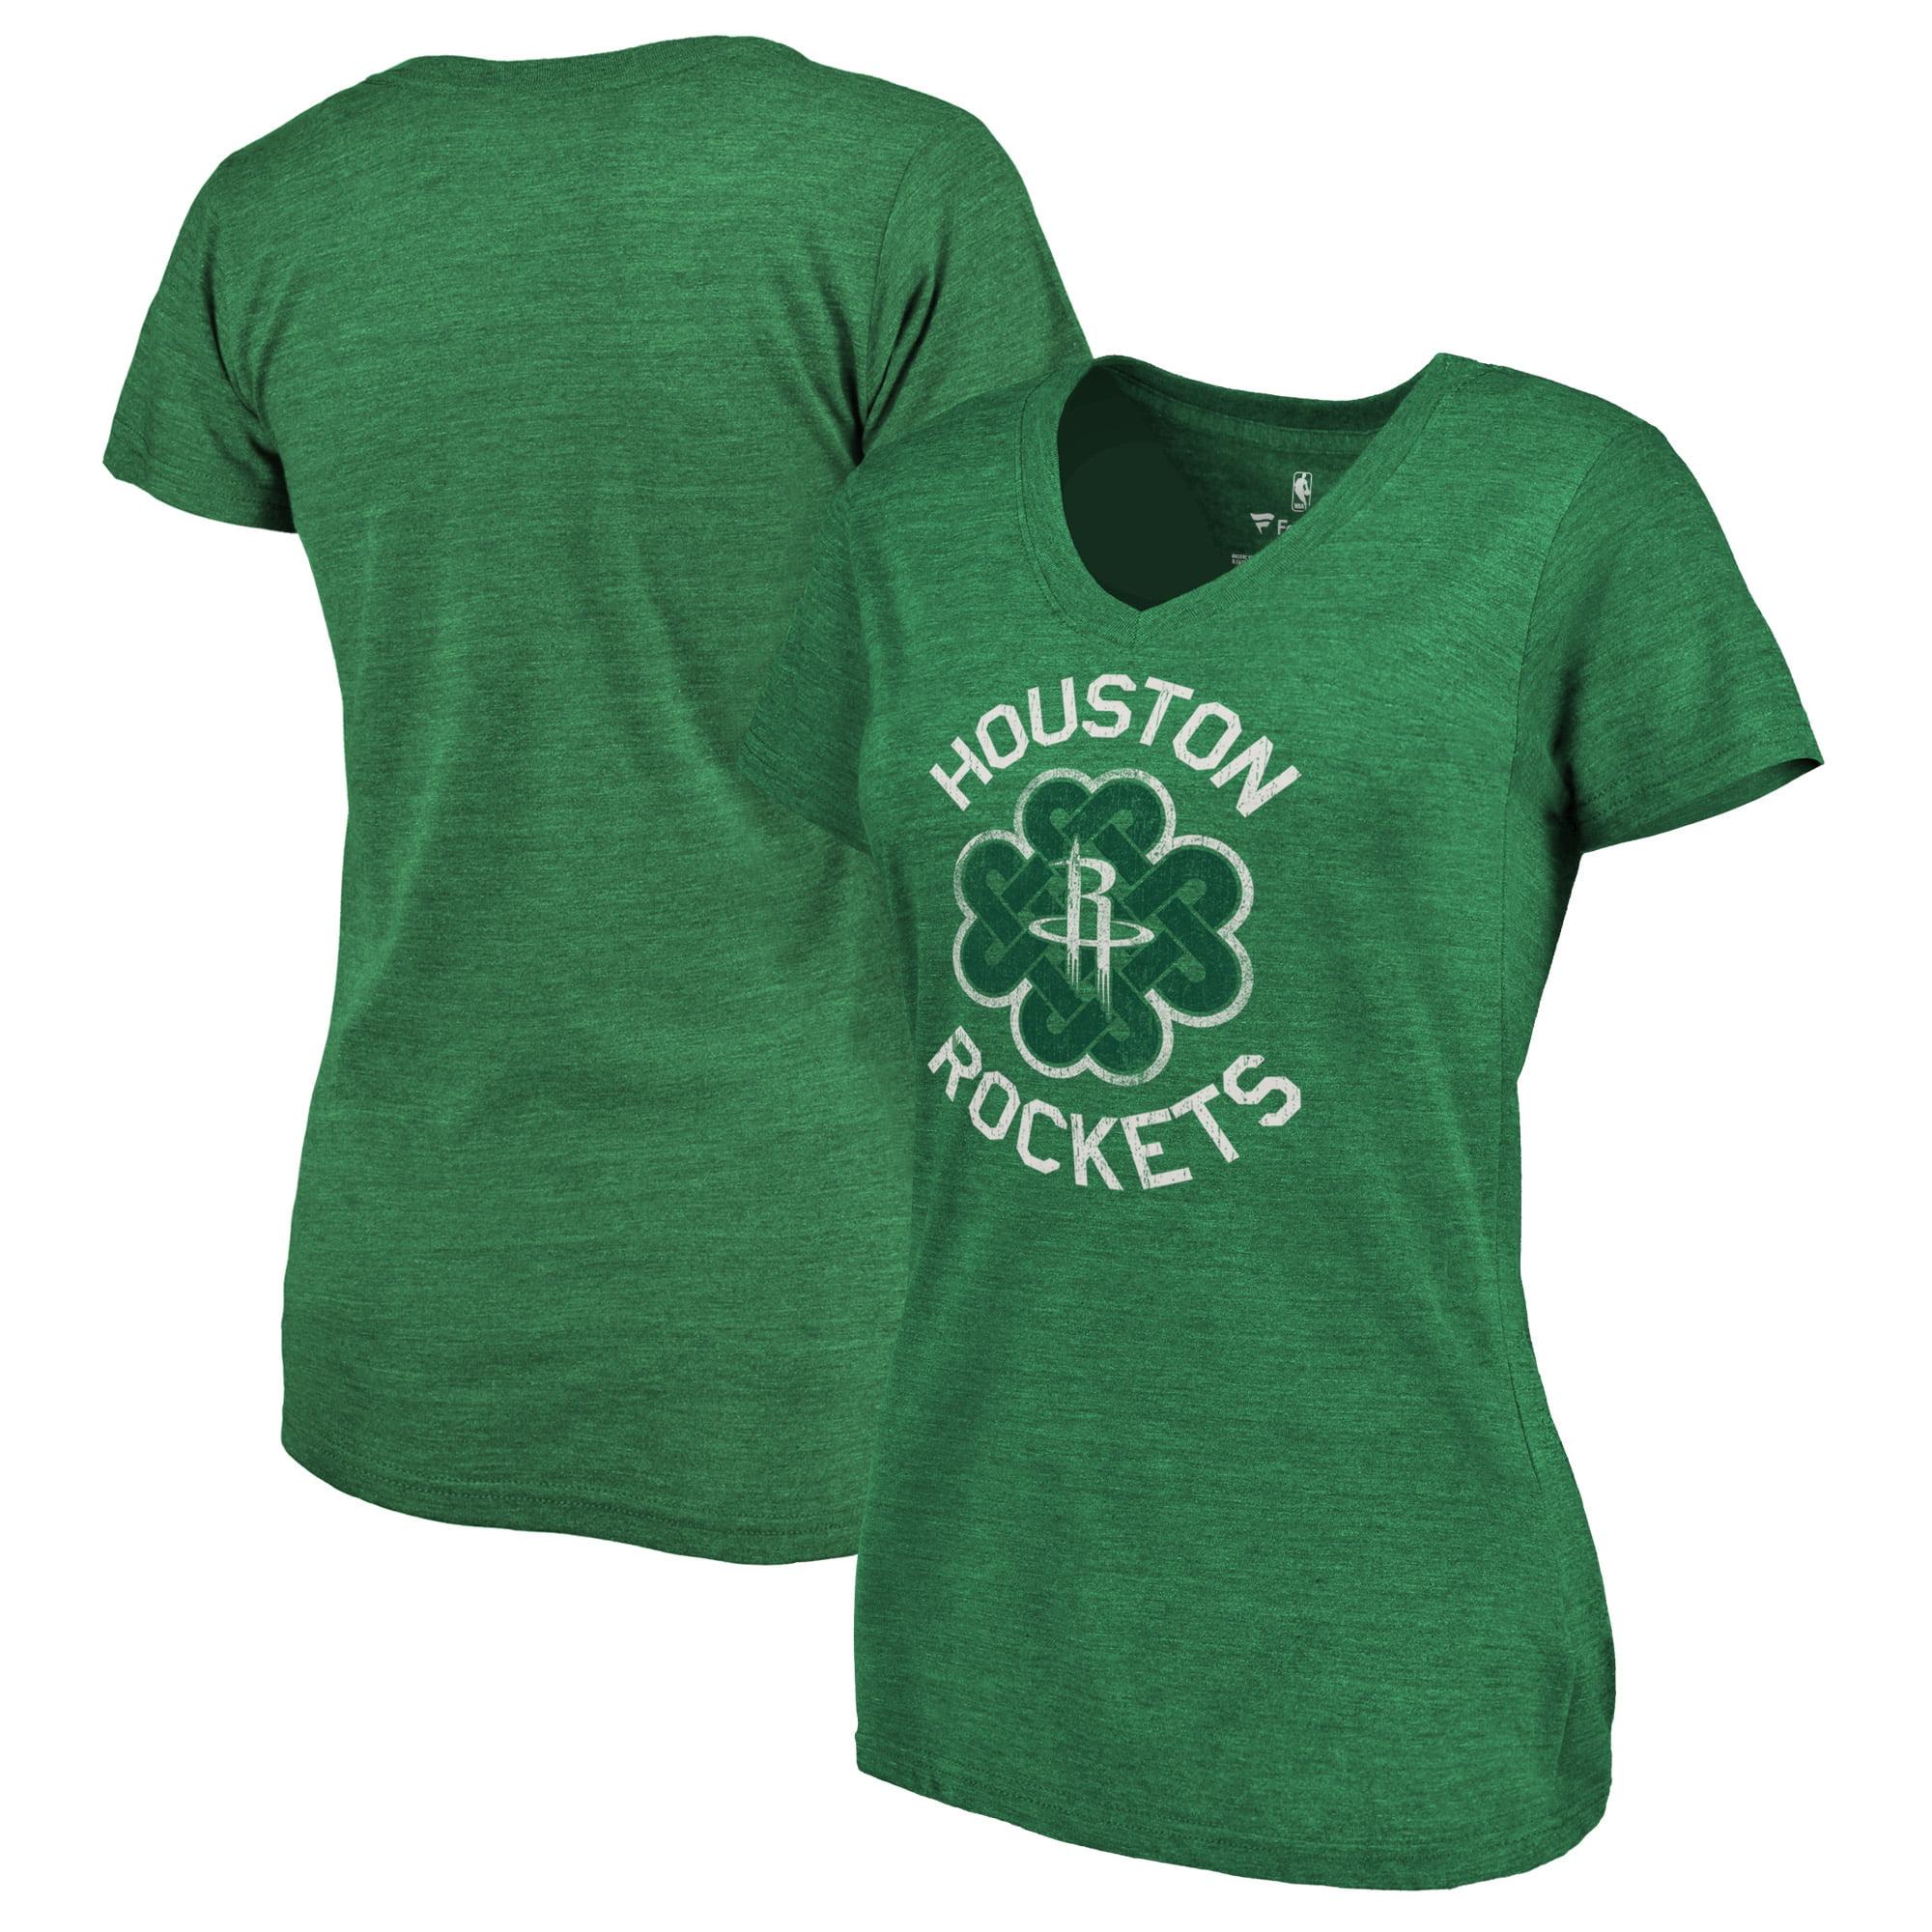 Houston Rockets Fanatics Branded Women's St. Patrick's Day Luck Tradition Tri-Blend V-Neck T-Shirt - Green